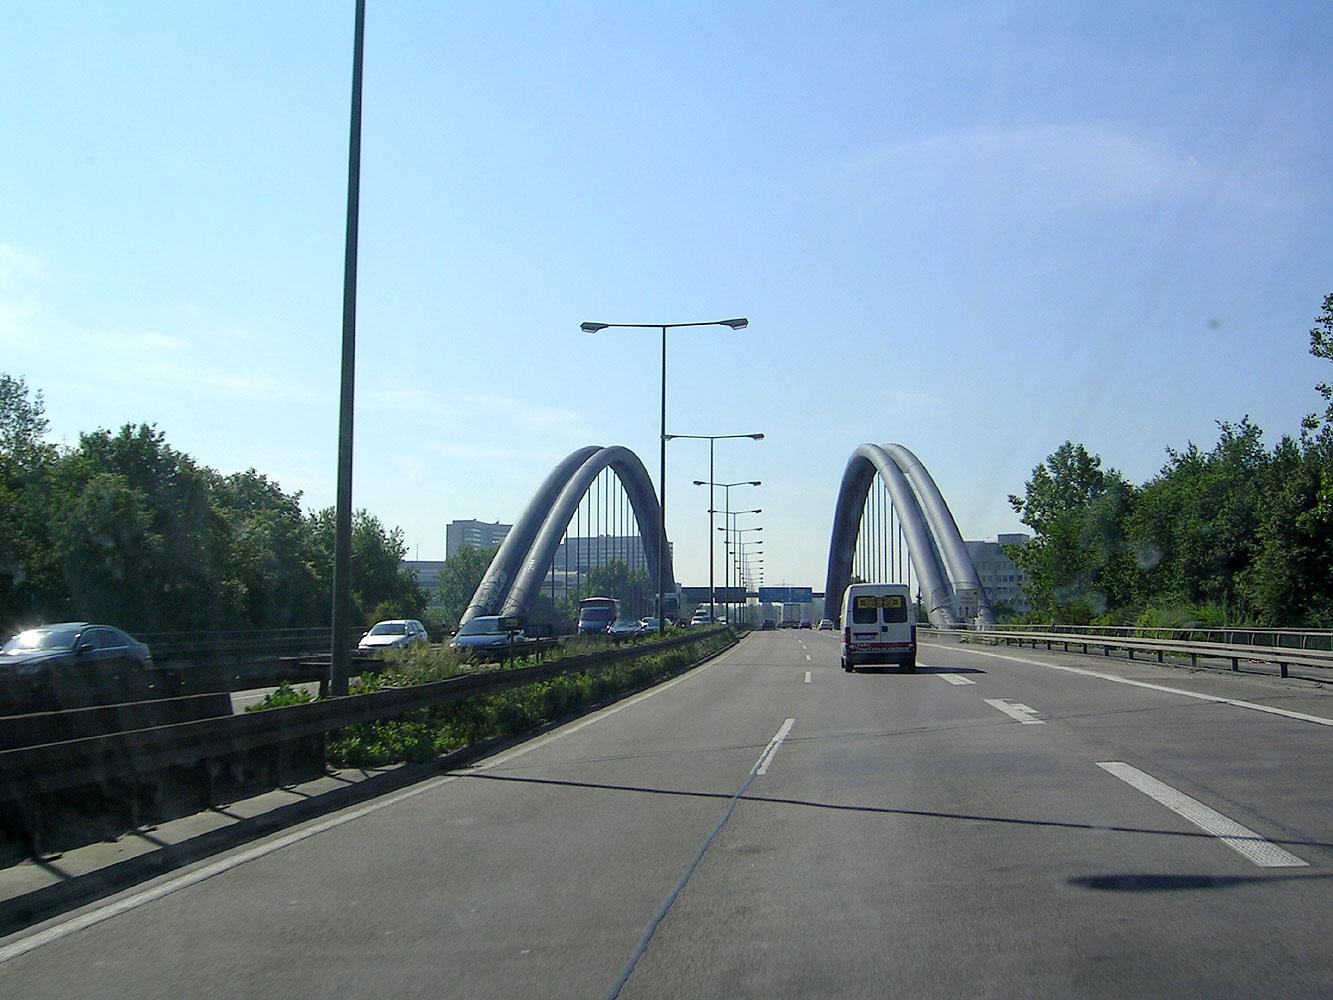 FileKaiserleibrücke, FrankfurtOffenbachjpg  Wikimedia